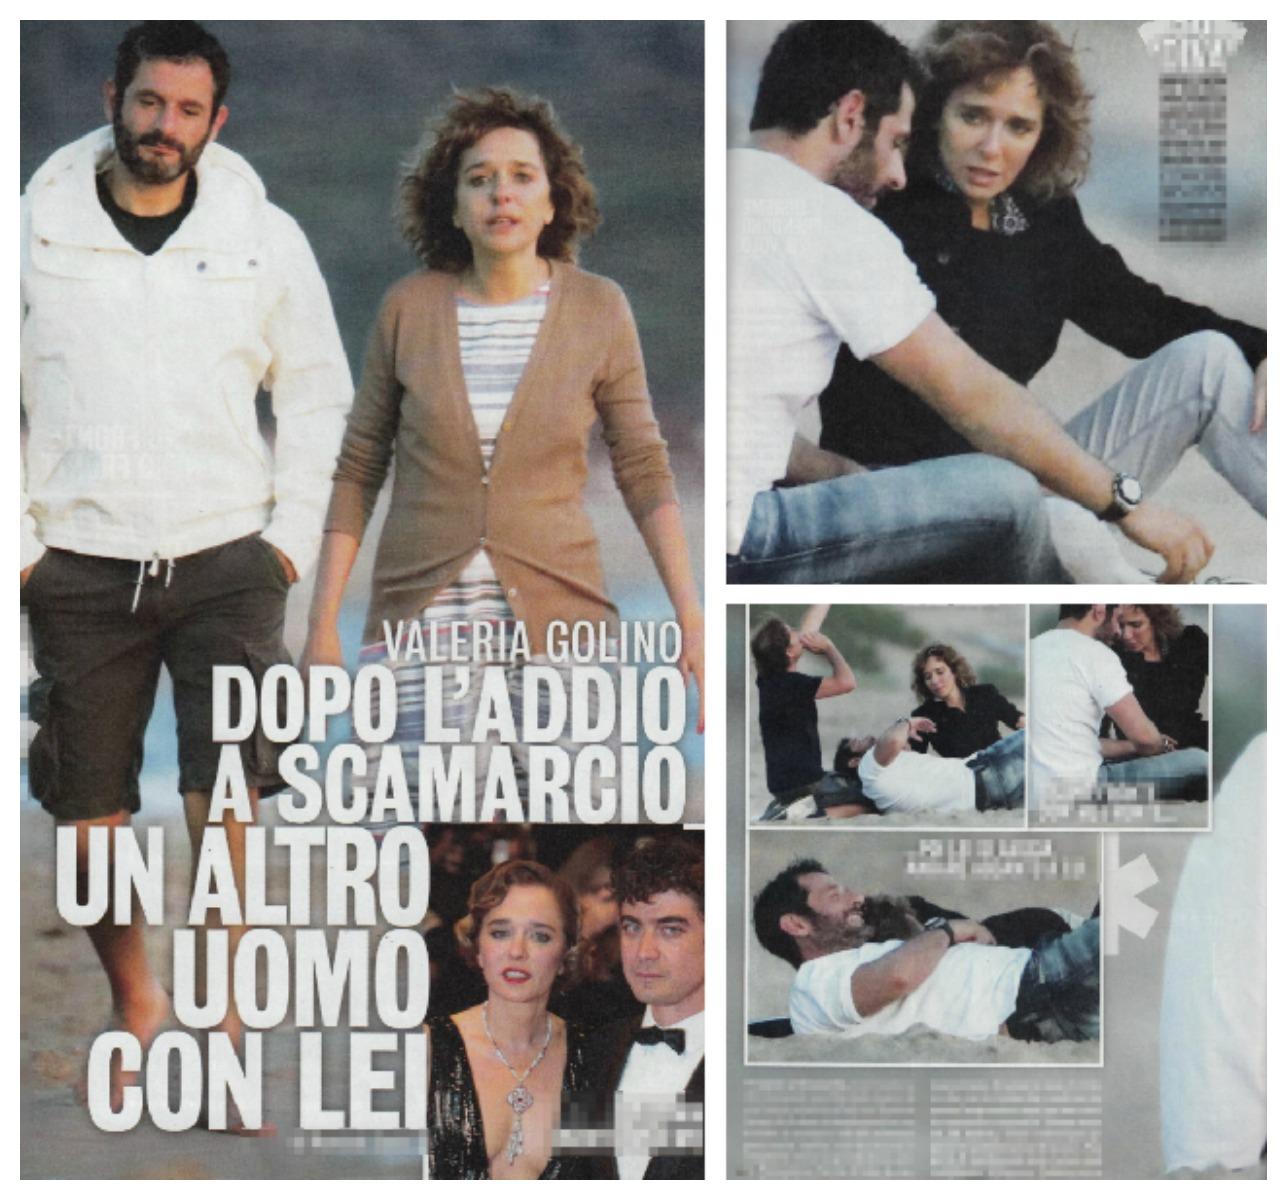 Valeria Golino e Gianluca De Marchi